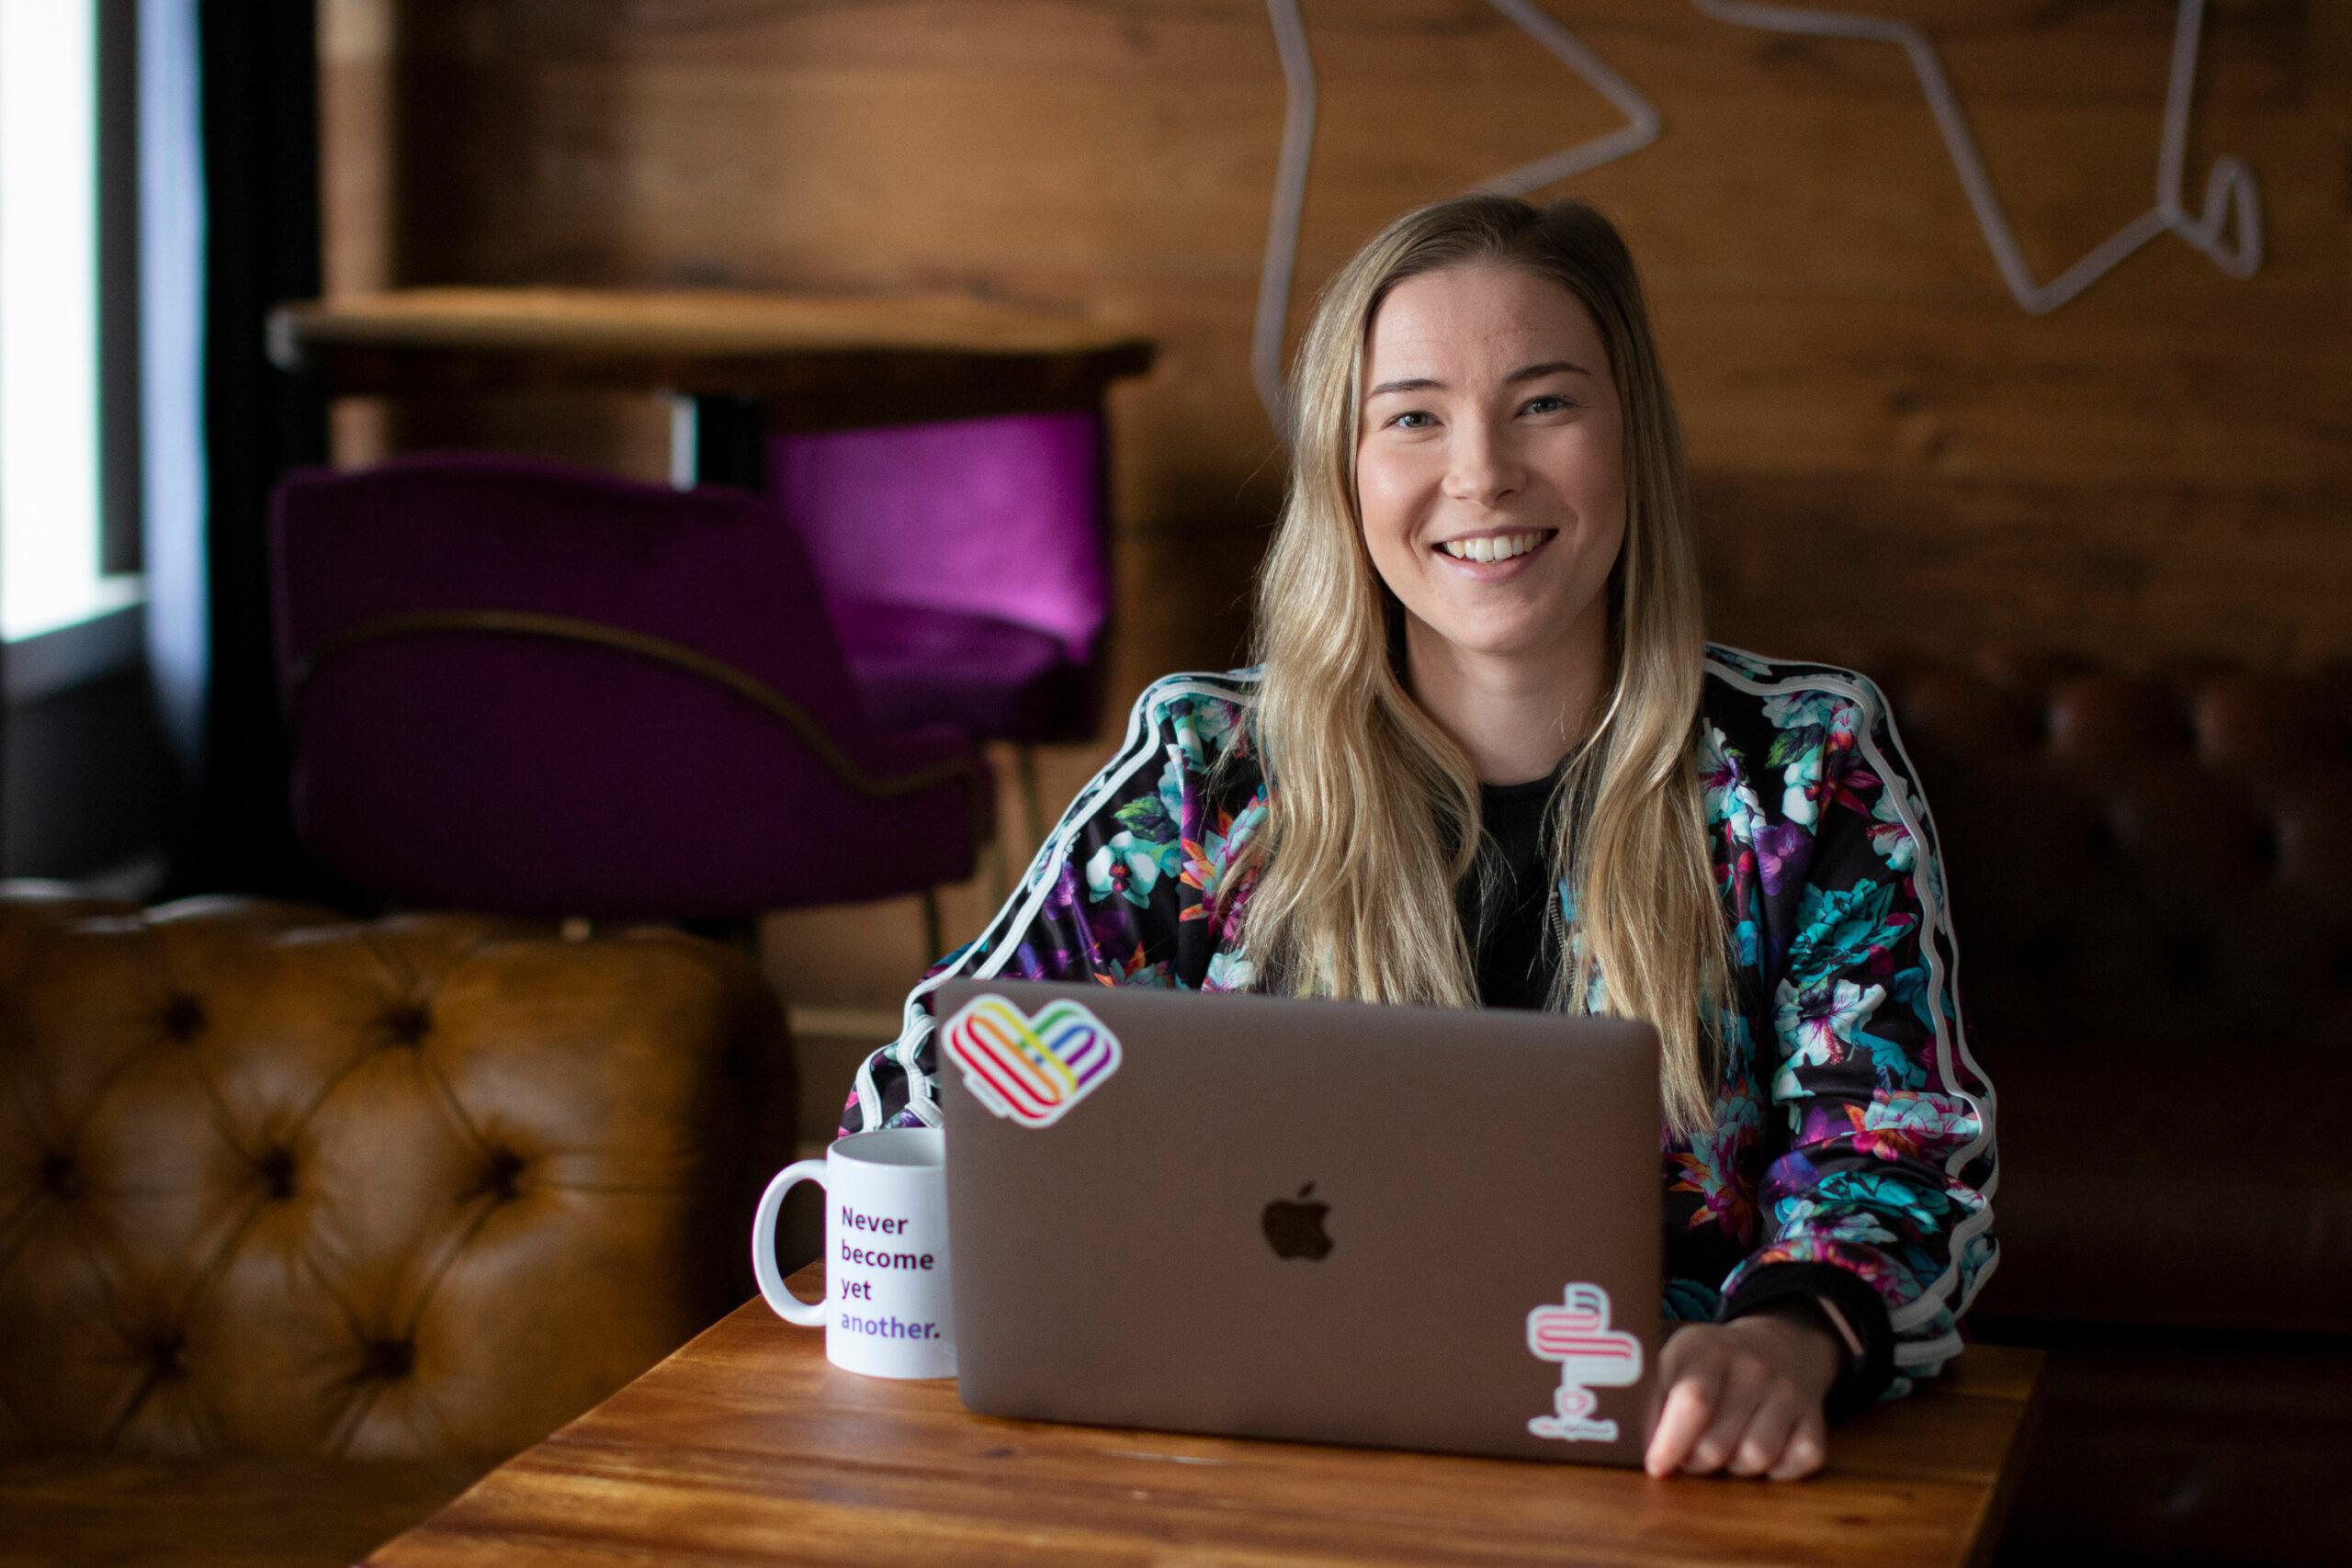 UpCloud's Digital marketing manager Hanna Tuomisto